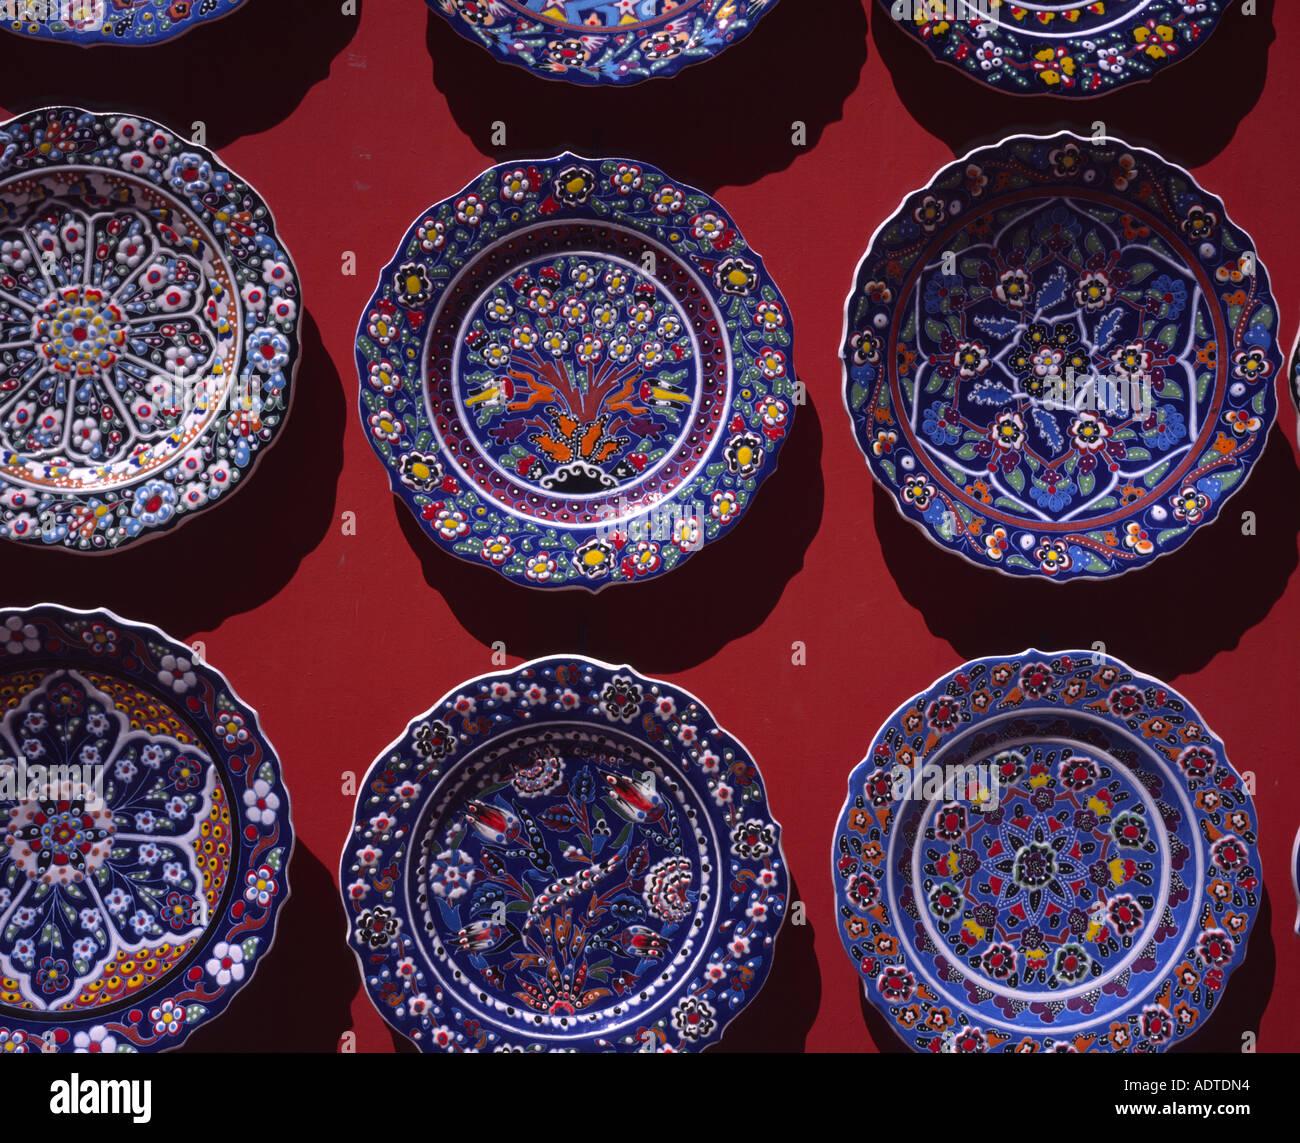 Decorative Plates Bursa Turkey Stock Photo Alamy